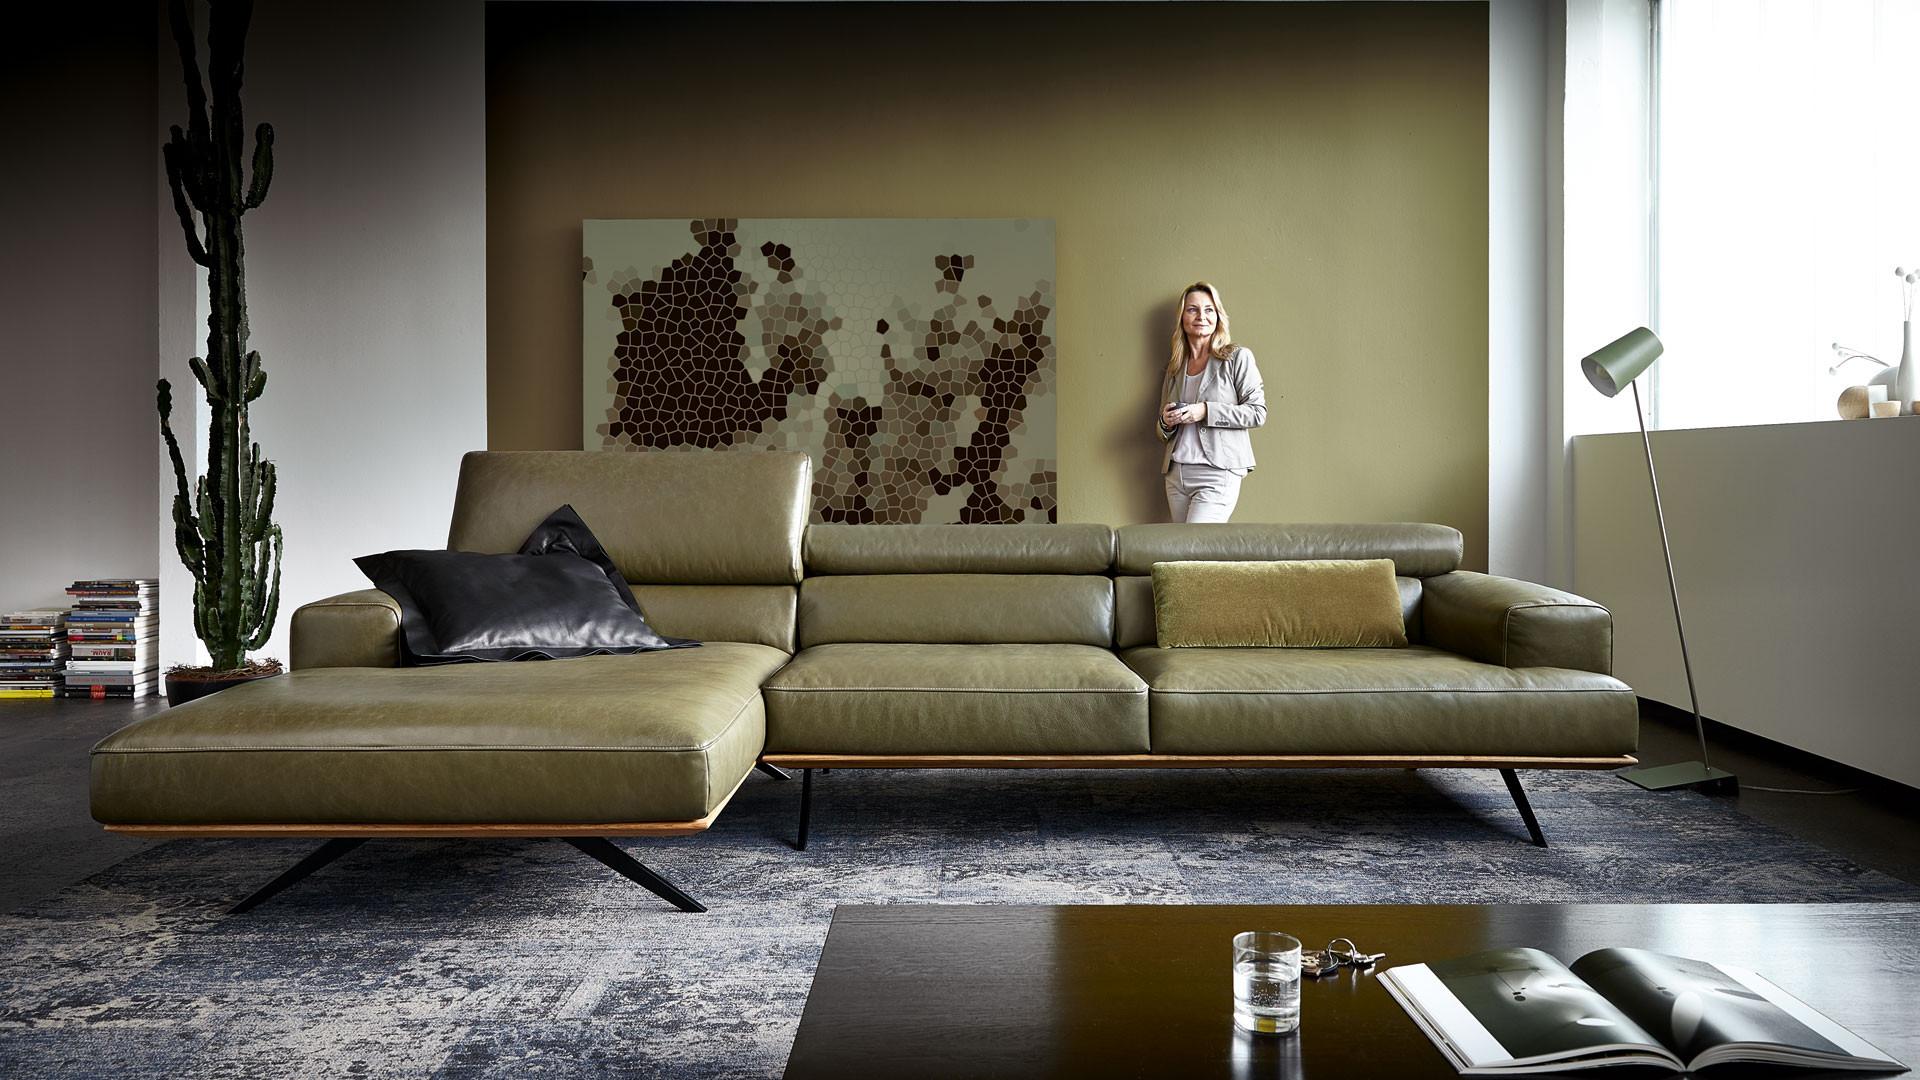 Koinor Sofa  Designersofas Polstermöbel sofas for friends dinner